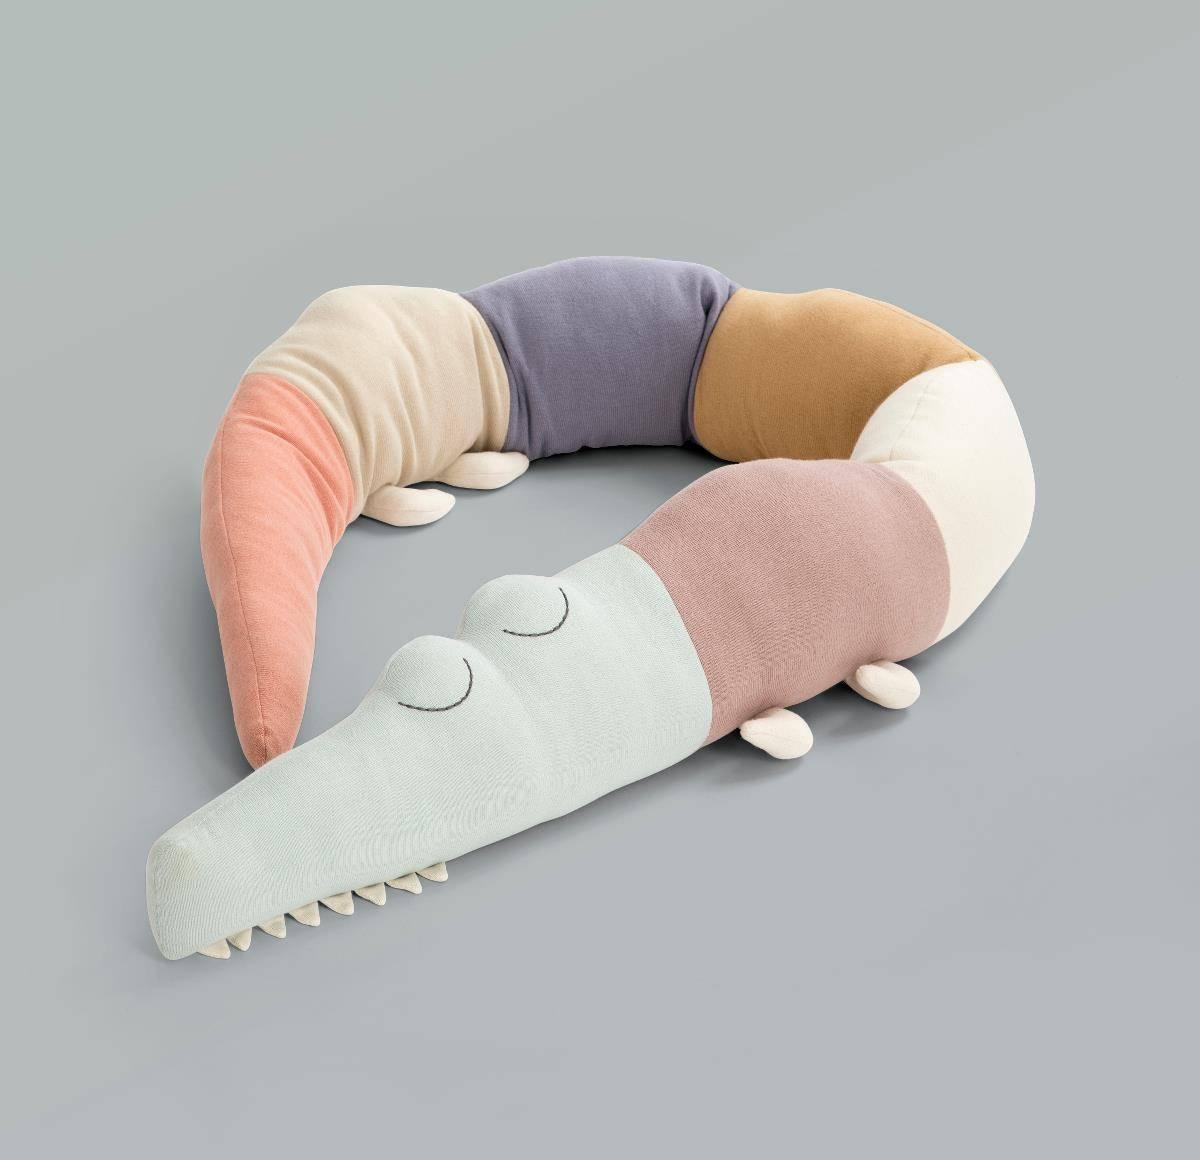 Sebra sengeslange Sleepy croc - day dream